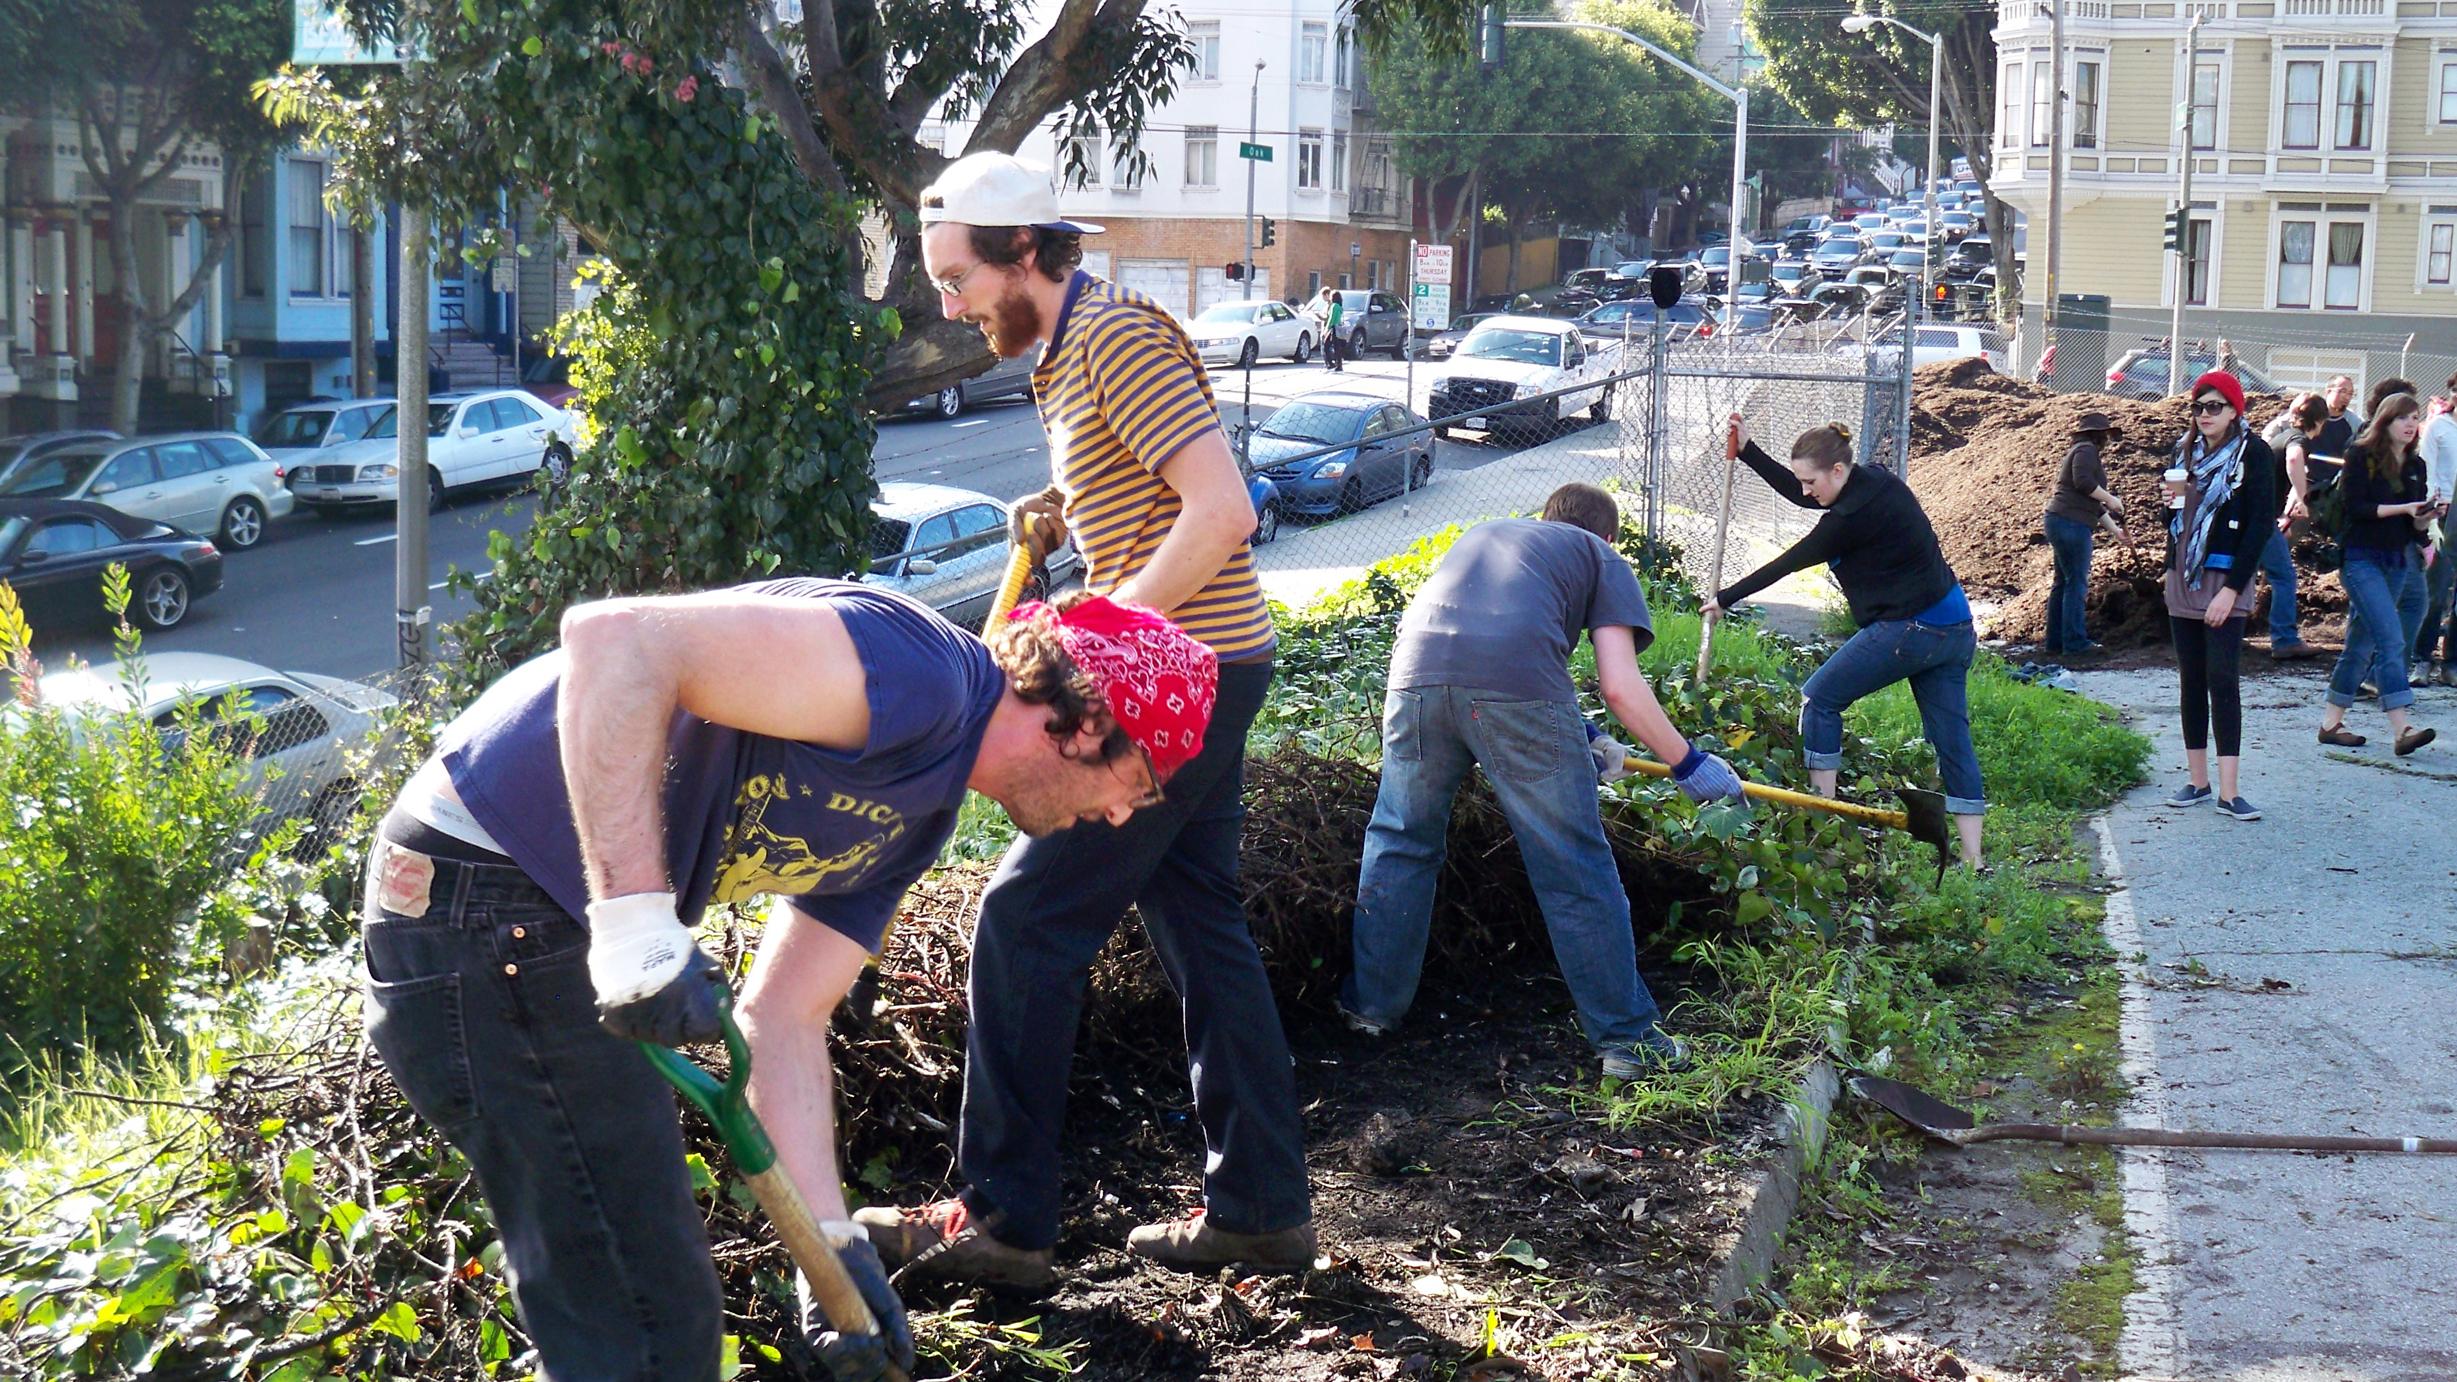 Tax Breaks May Turn San Franciscou0027s Vacant Lots Into Urban Farms : The Salt  : NPR